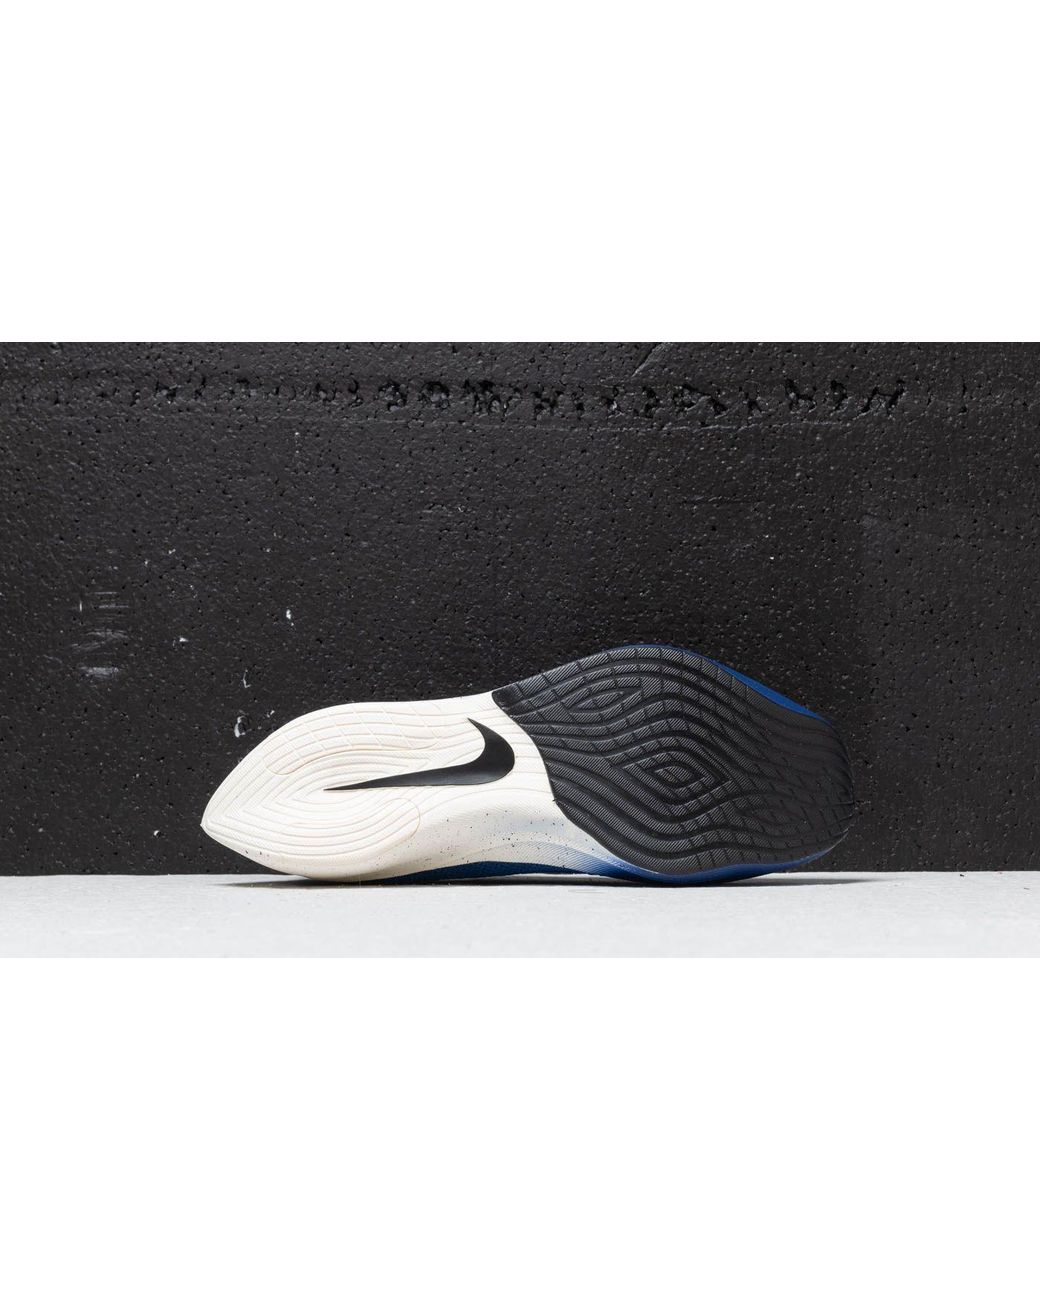 697ae5d9bec42 Lyst - Nike Vapor Street Flyknit Deep Royal  Black-college Navy in Blue for  Men